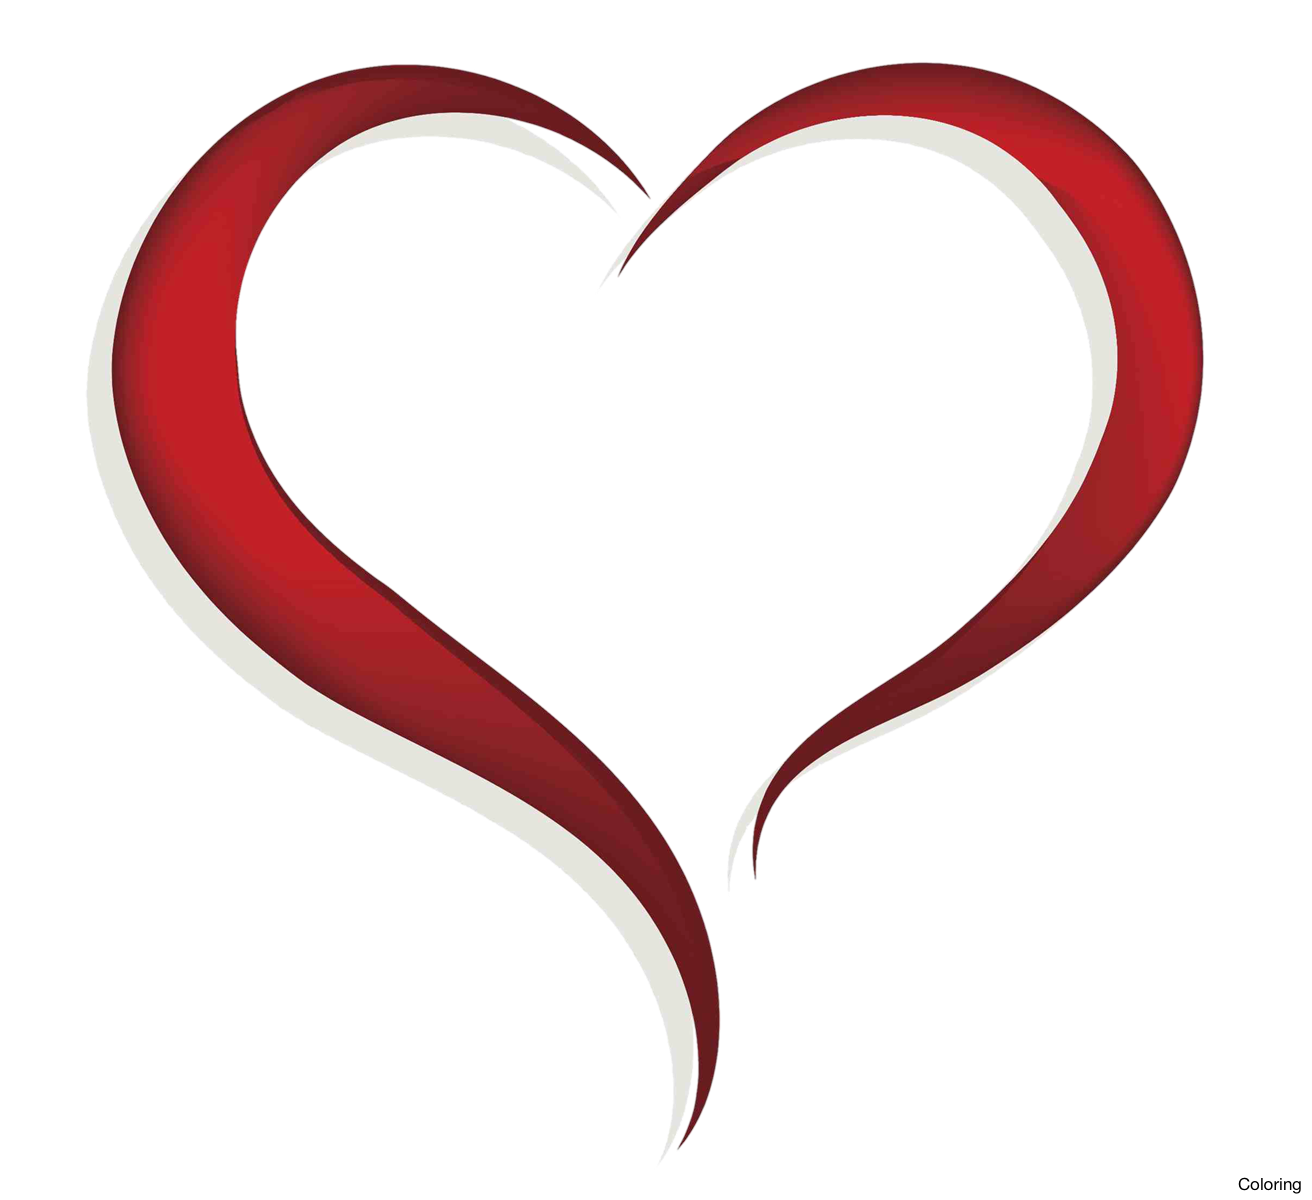 Hearts clipart vegetable. Free heart jokingart com